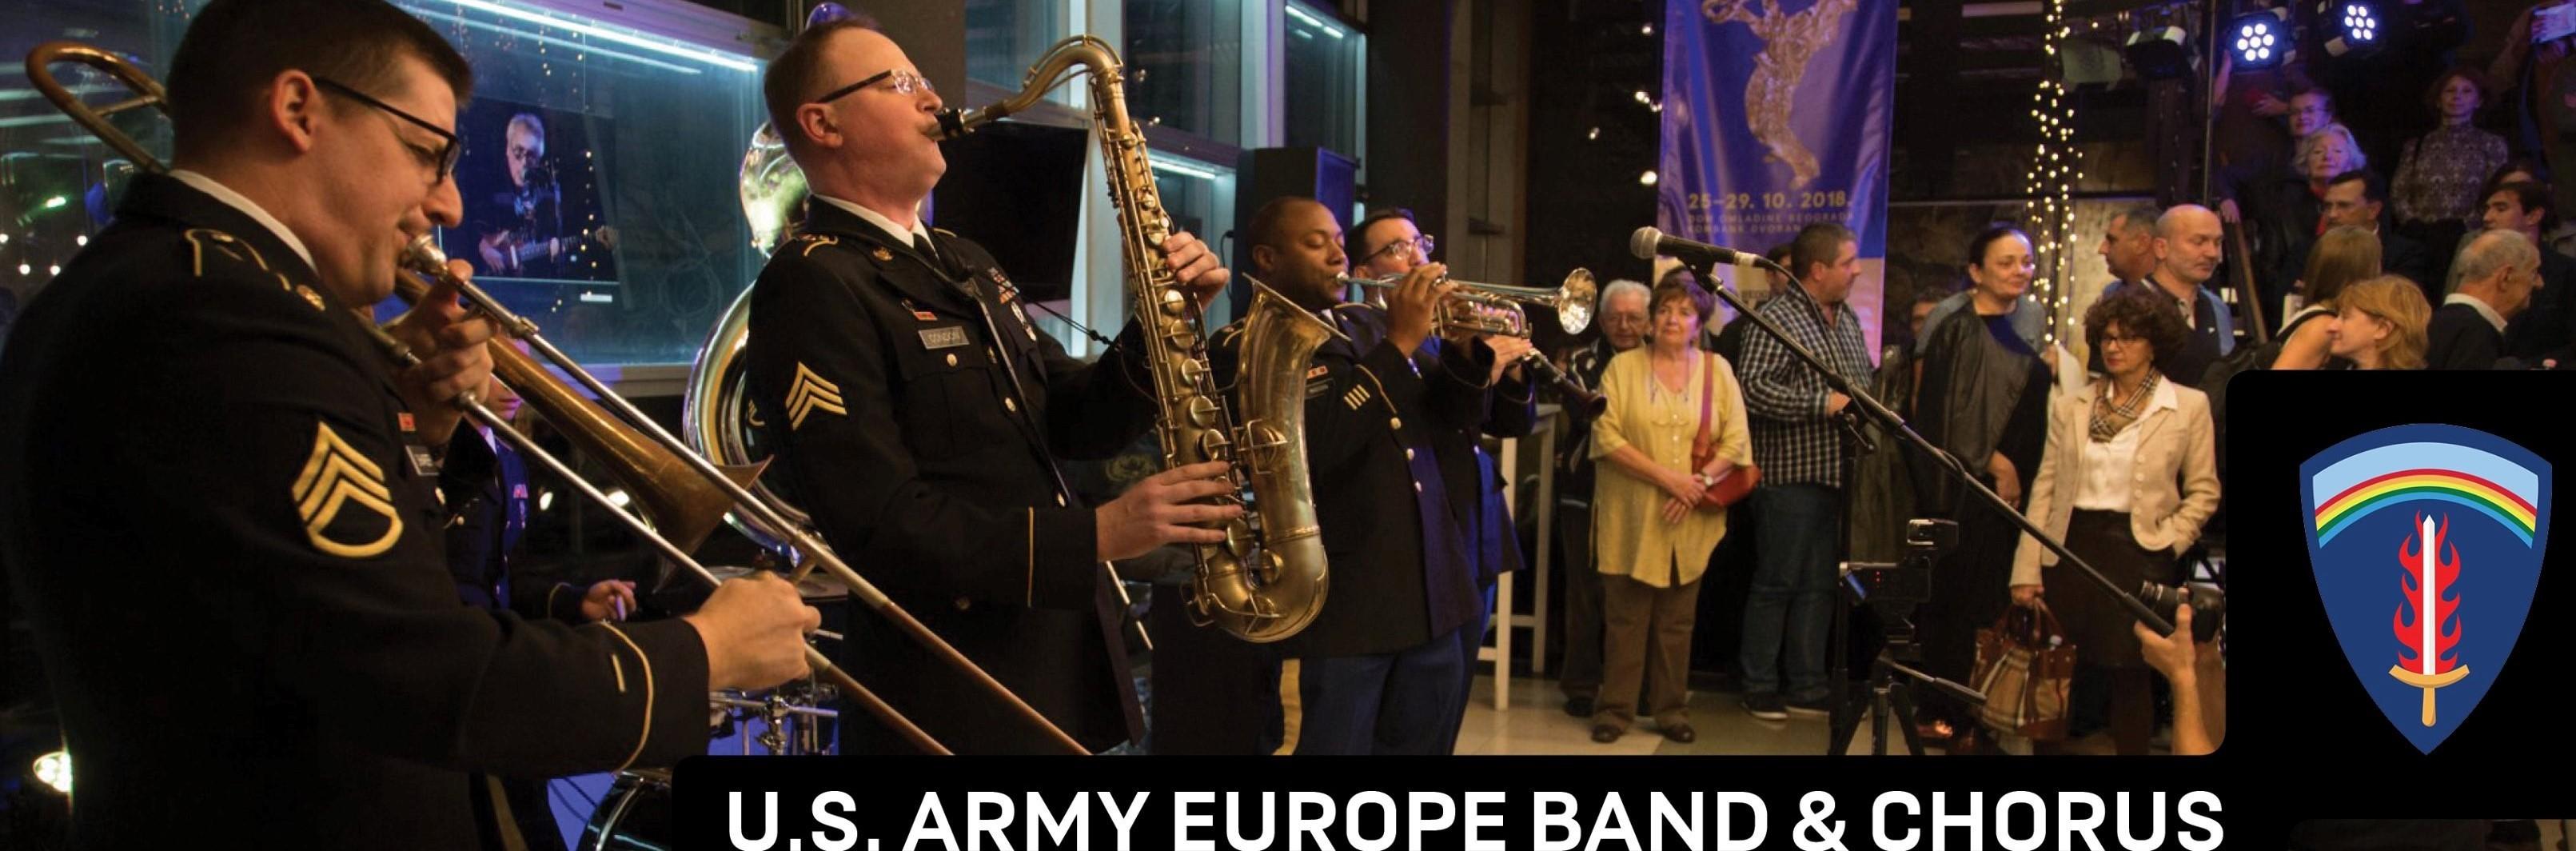 Band & Chorus Home